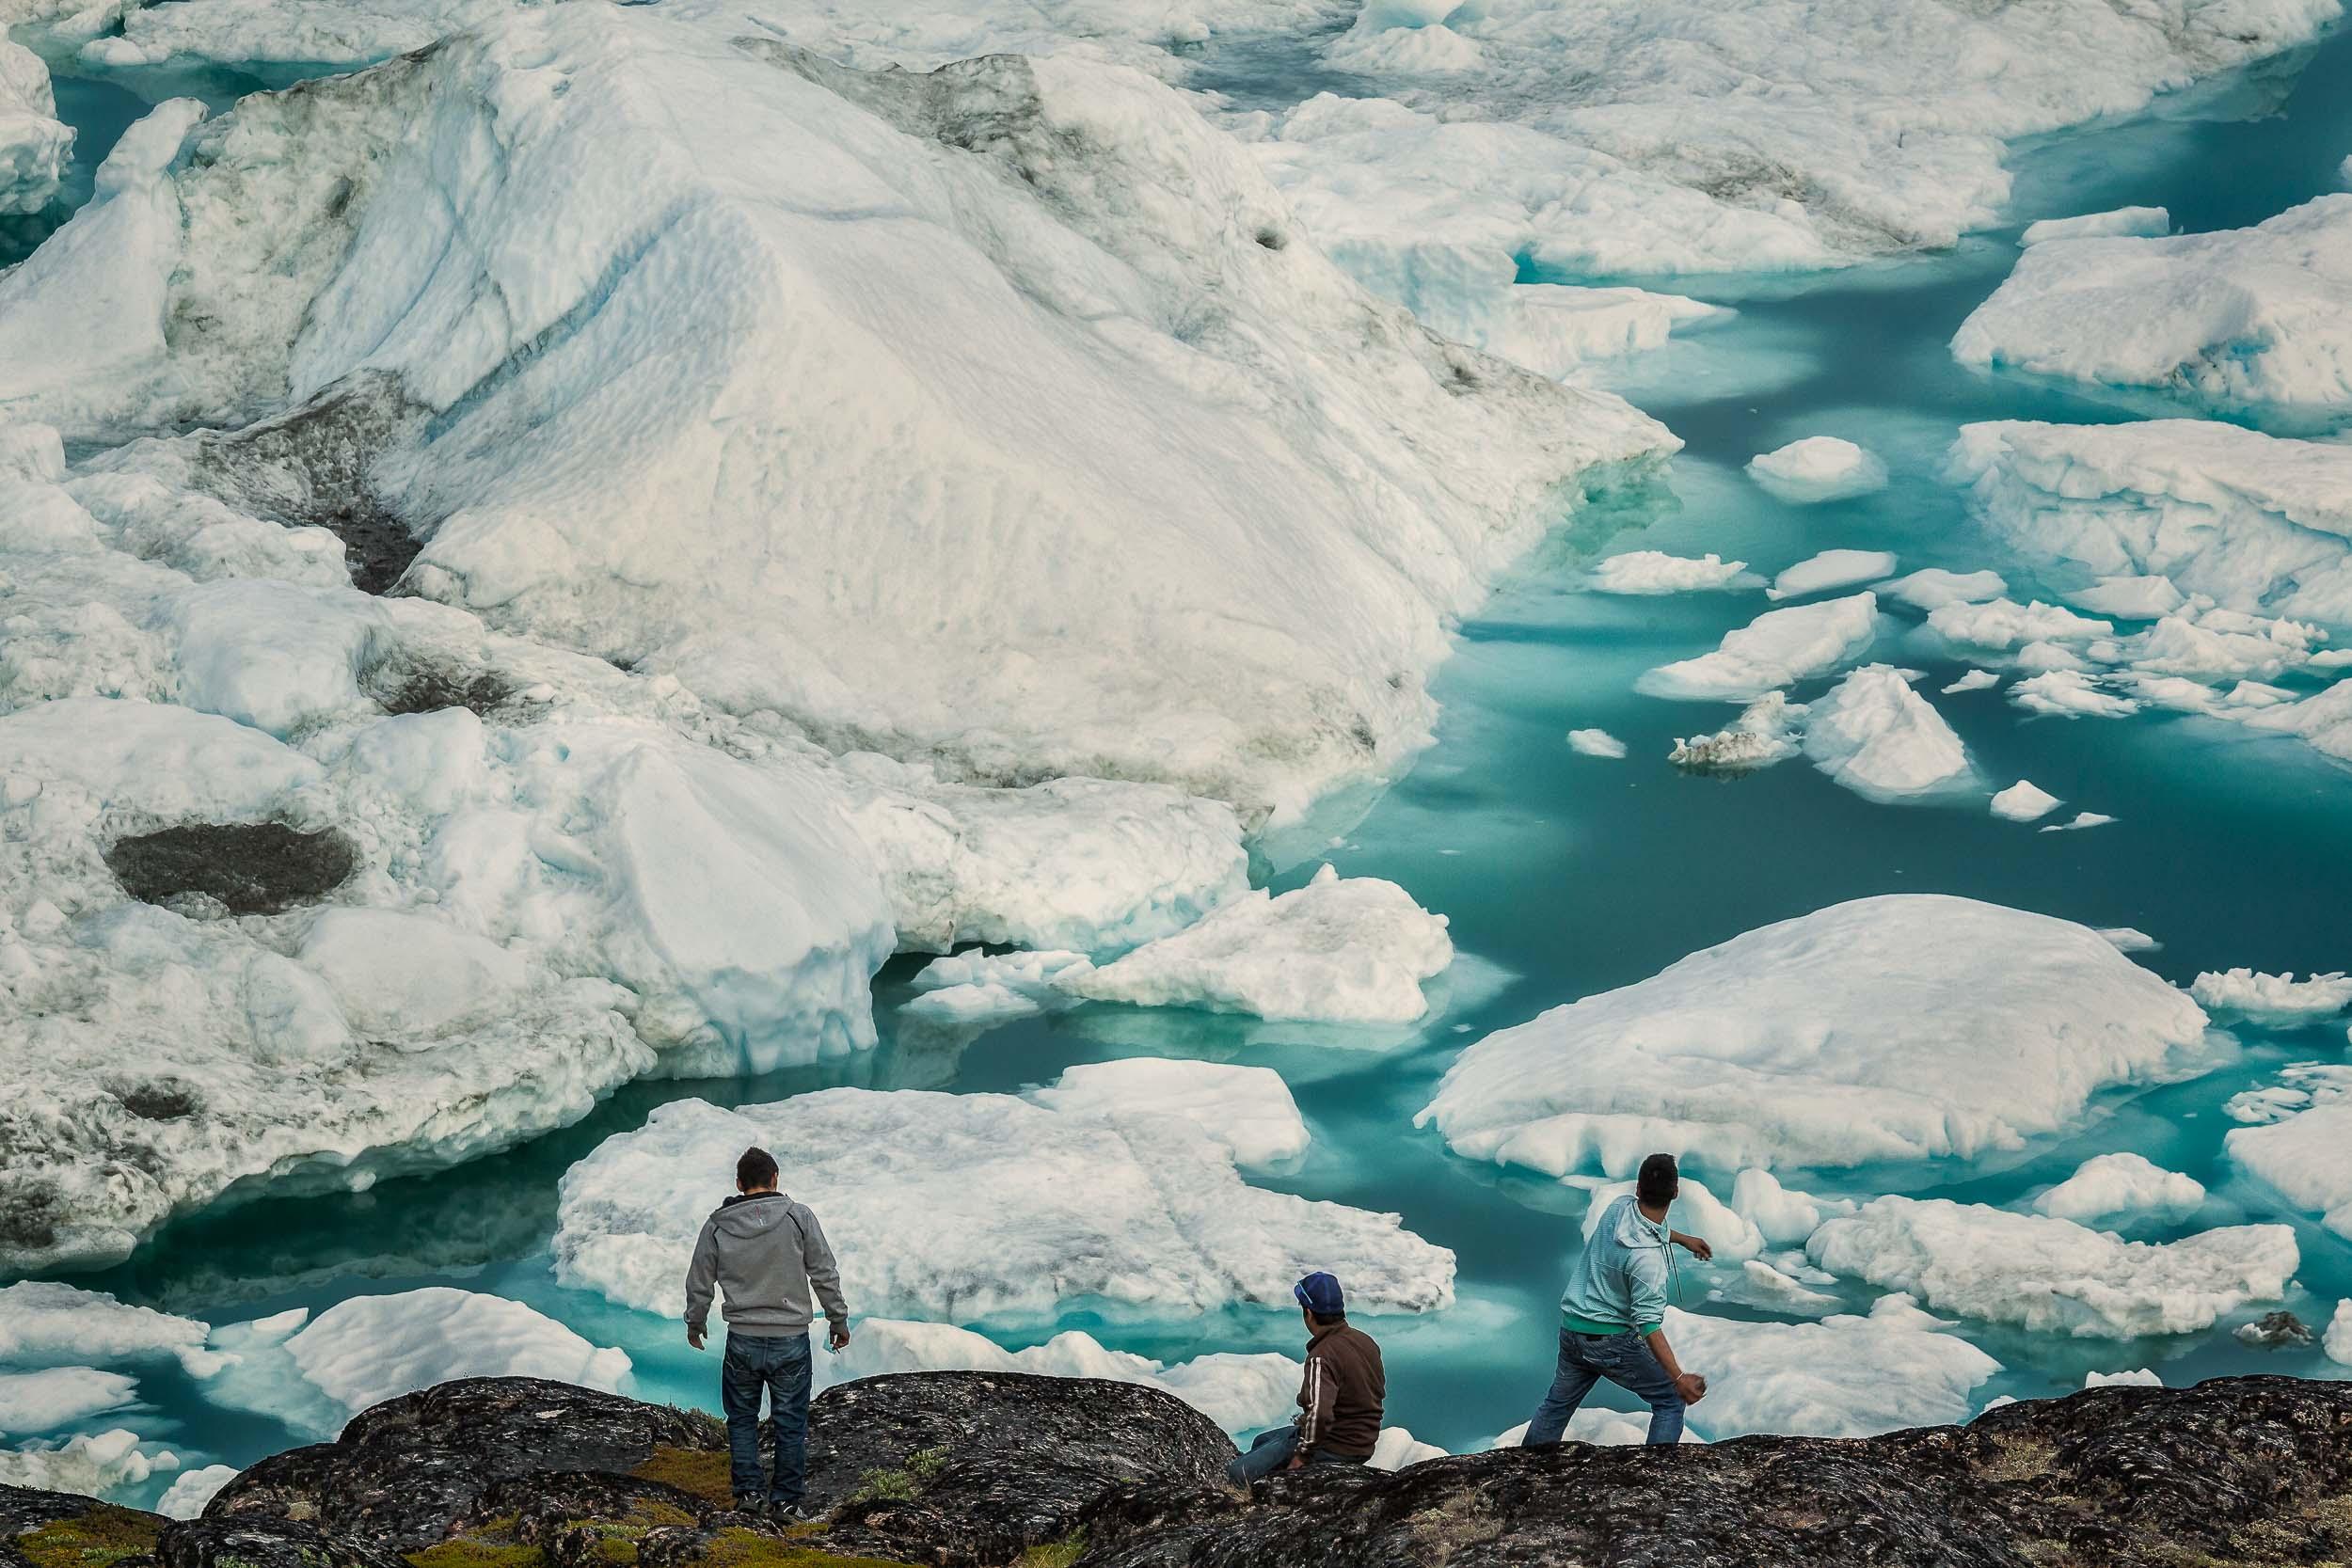 Three local    inuit men    on the edge of the wild near    Ilulissat, Greenland   .